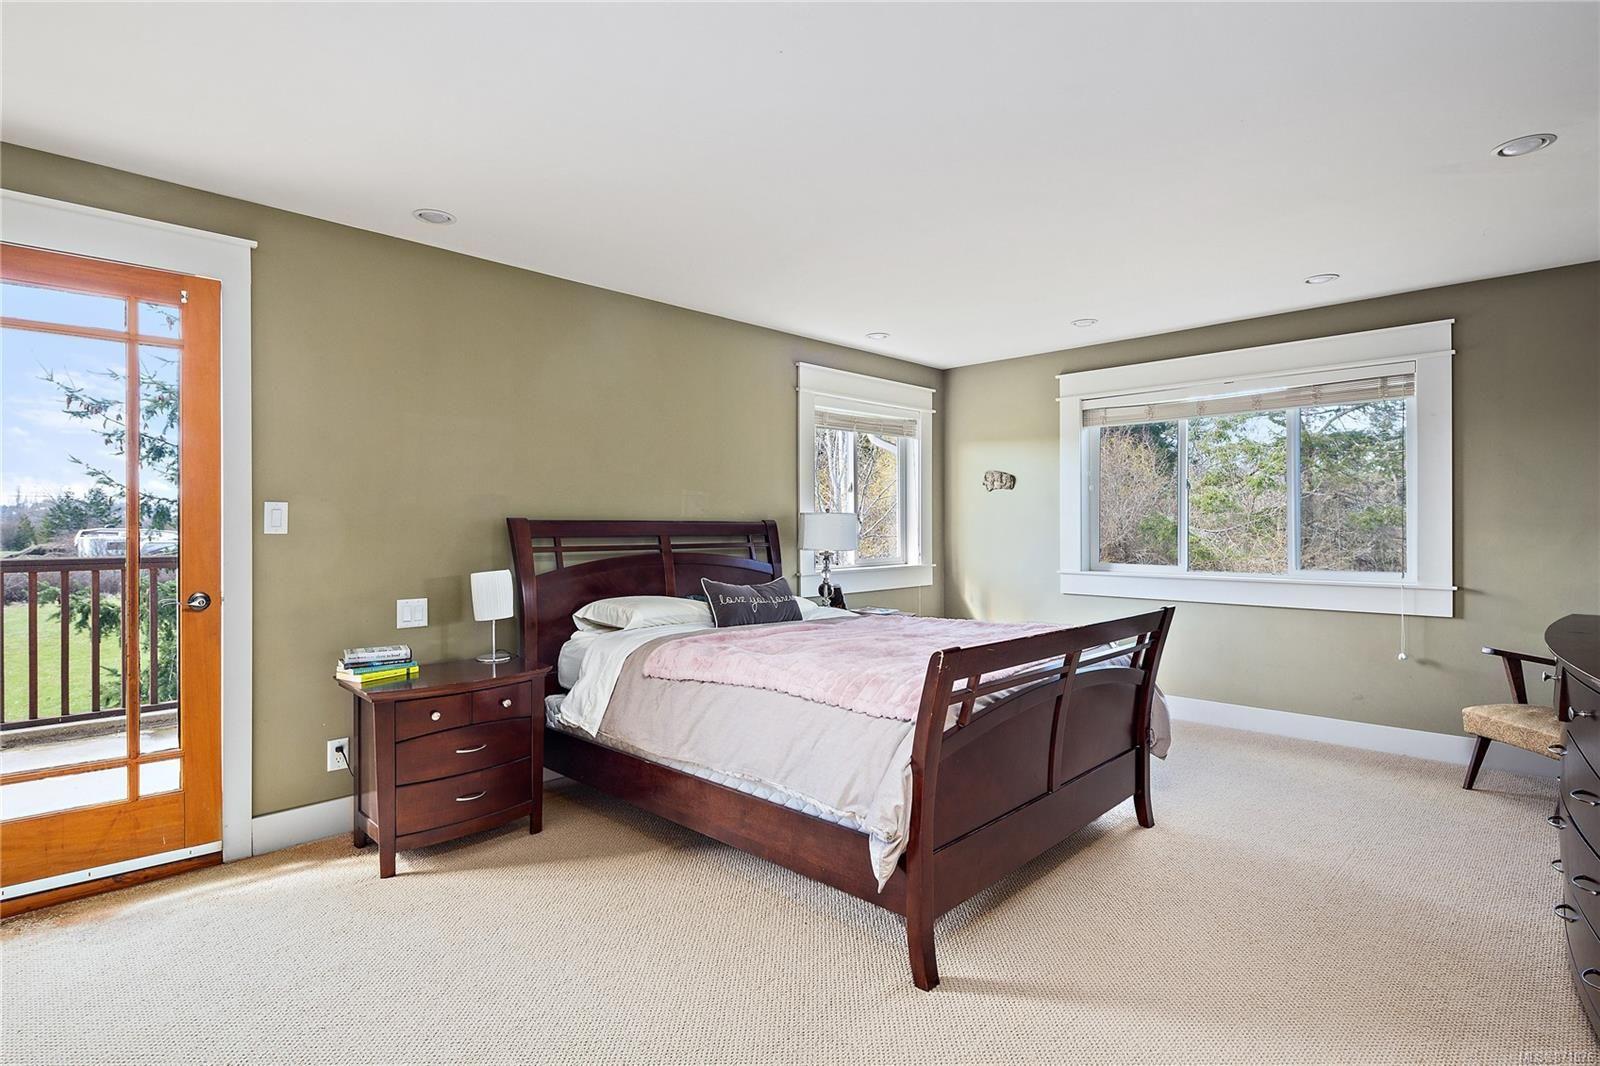 Photo 17: Photos: 4420 Wilkinson Rd in : SW Royal Oak House for sale (Saanich West)  : MLS®# 871876